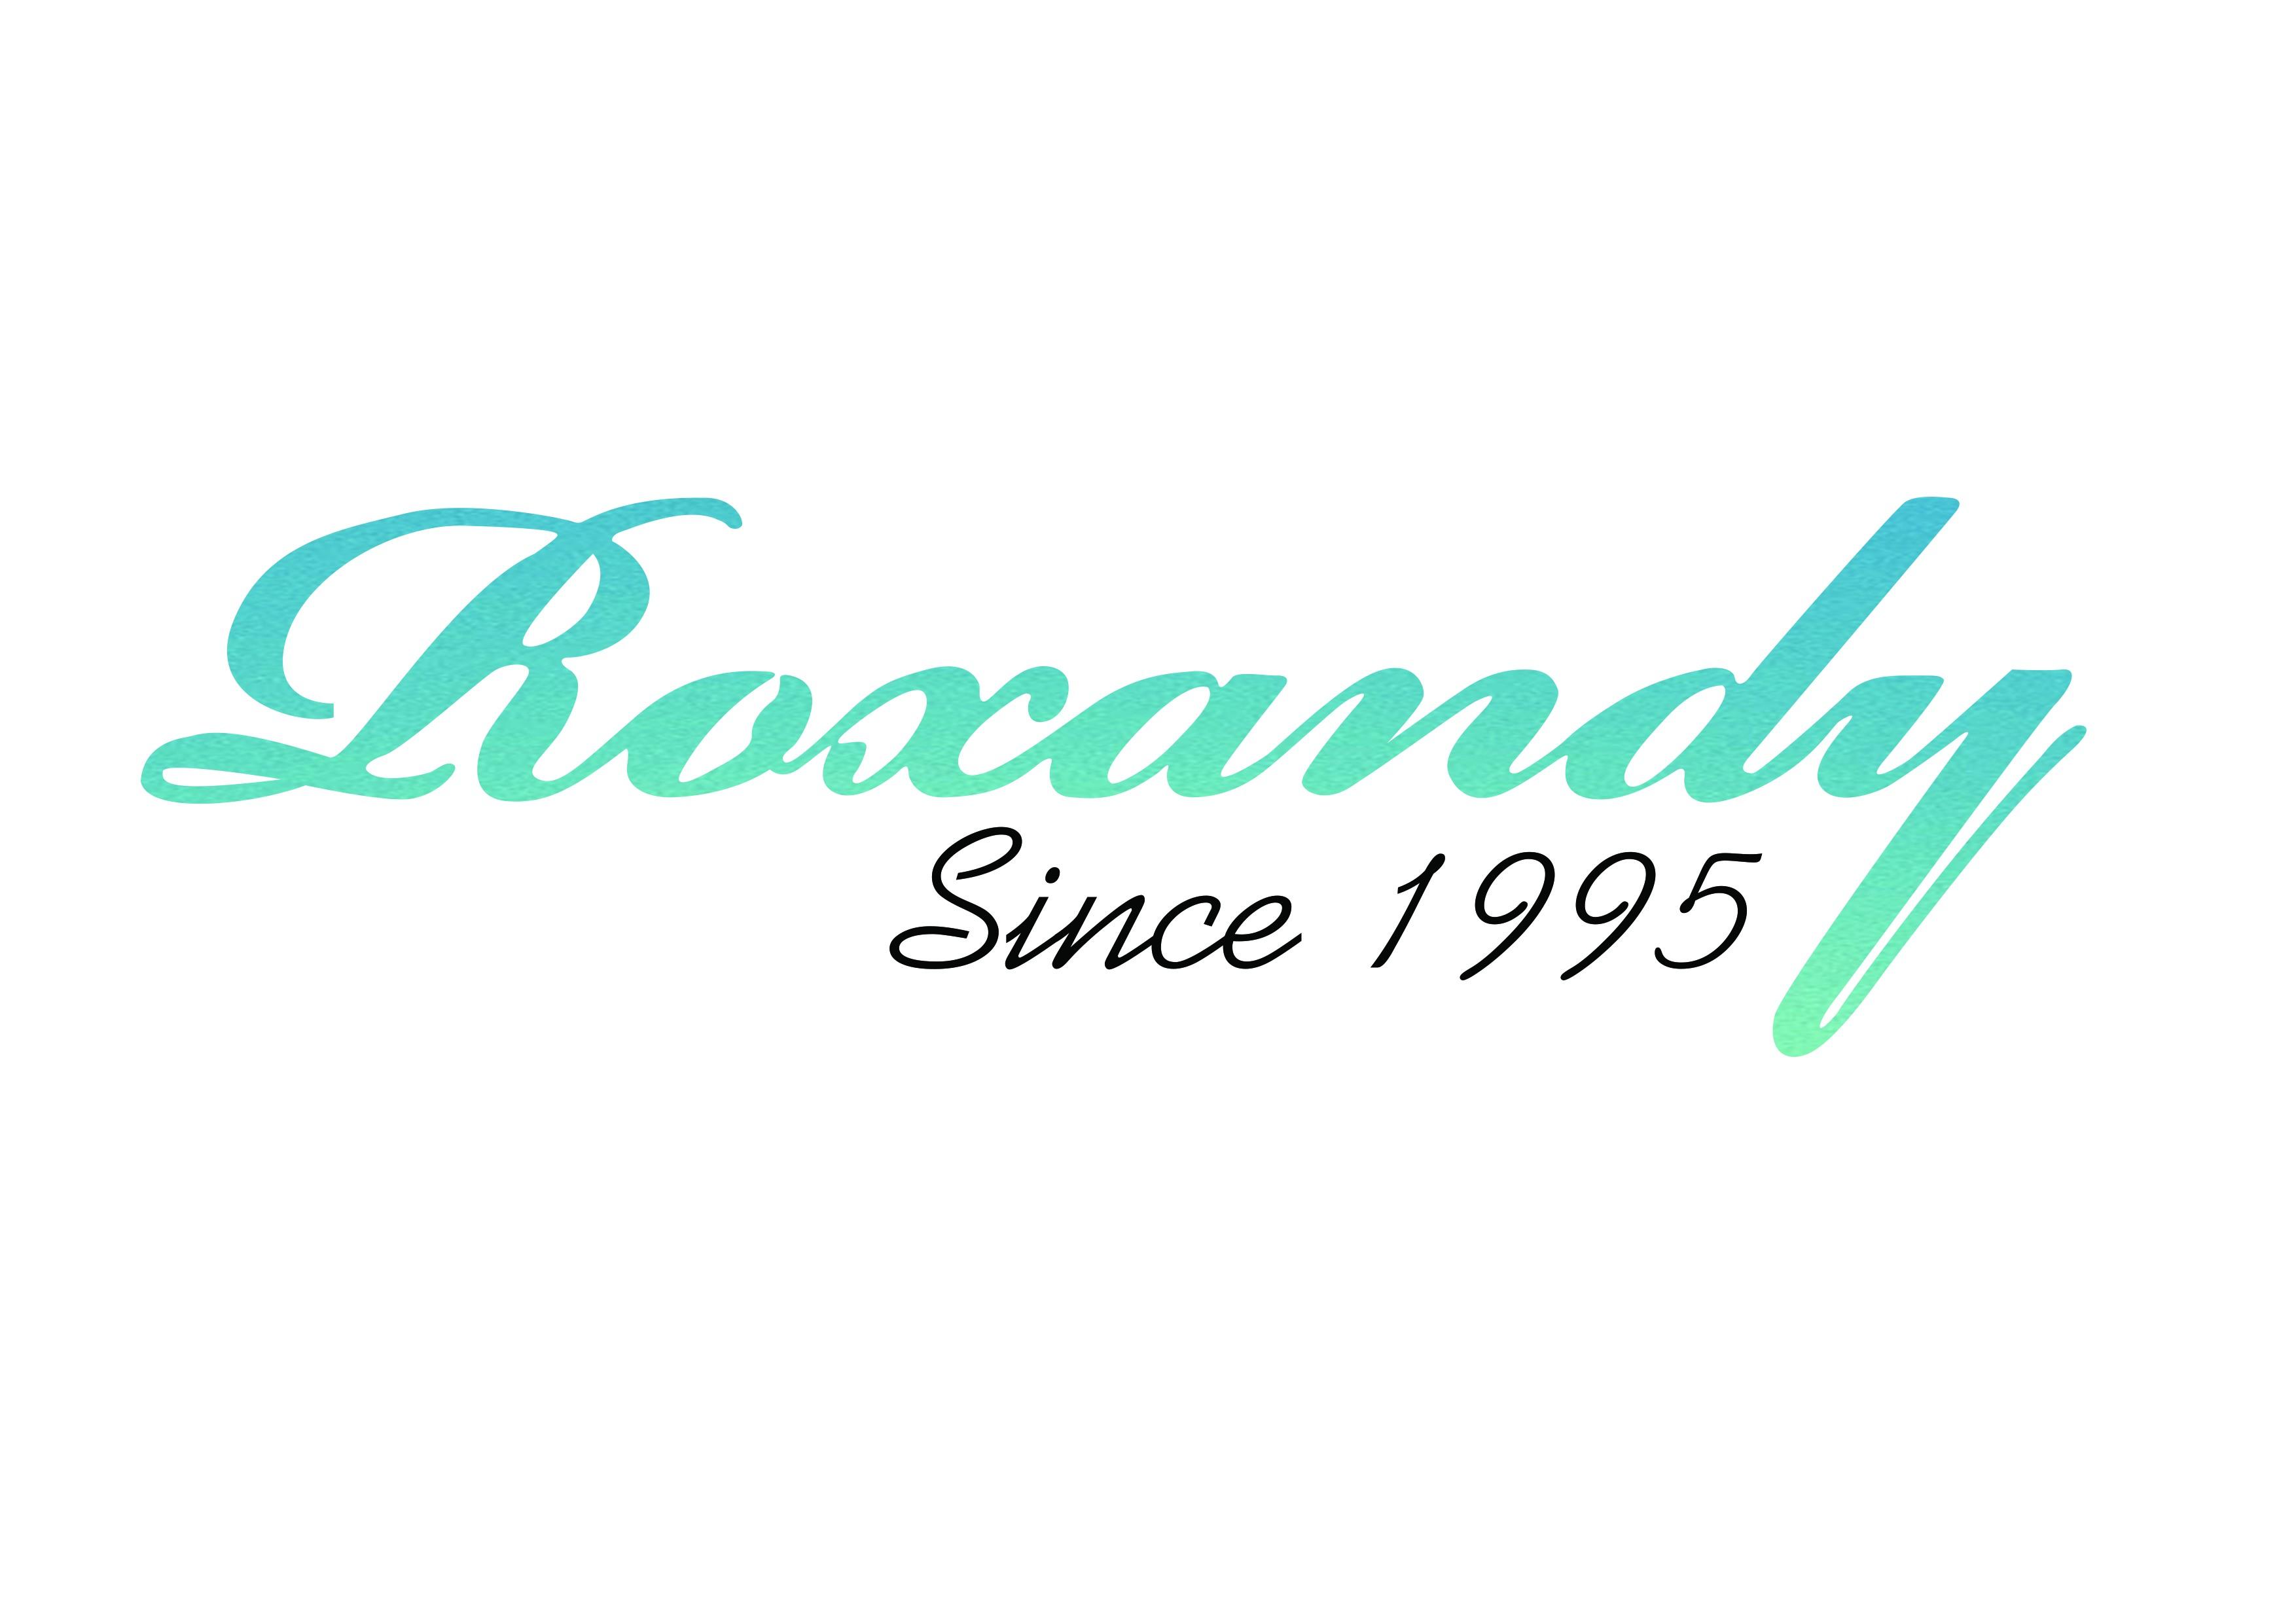 Roxandy